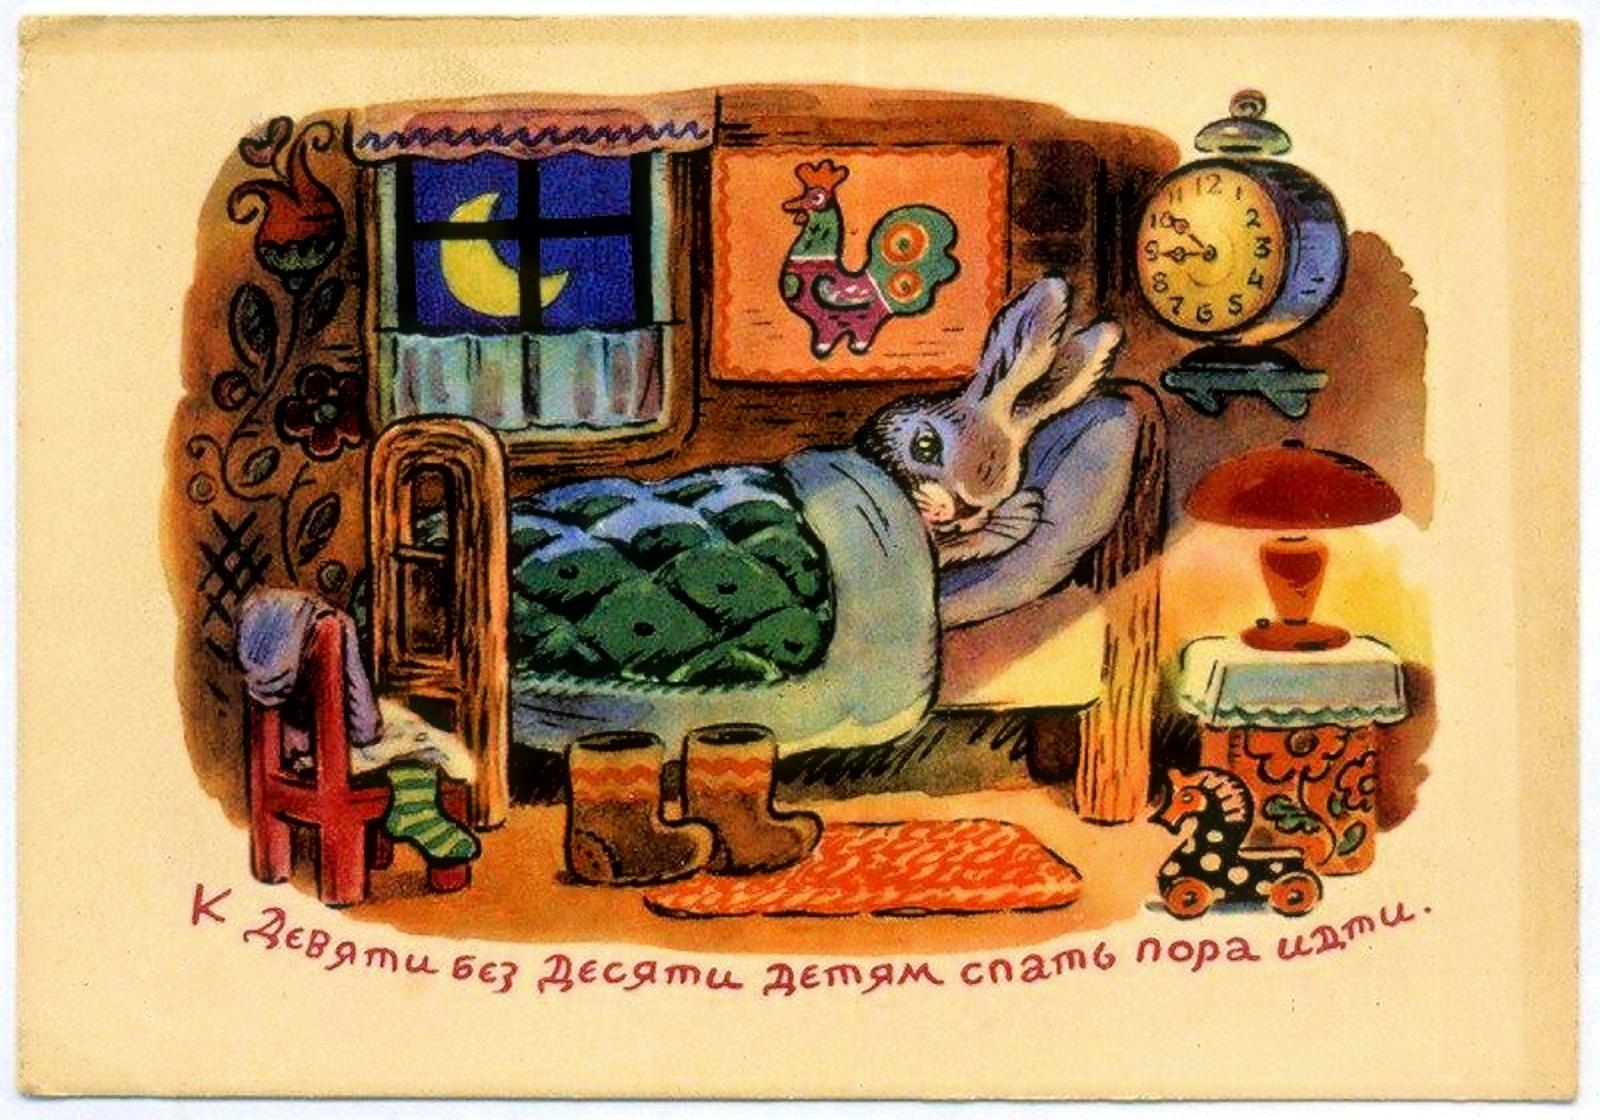 00 Konstantin Zotov. Kids Should Be in Bed by Ten to Nine. 1964